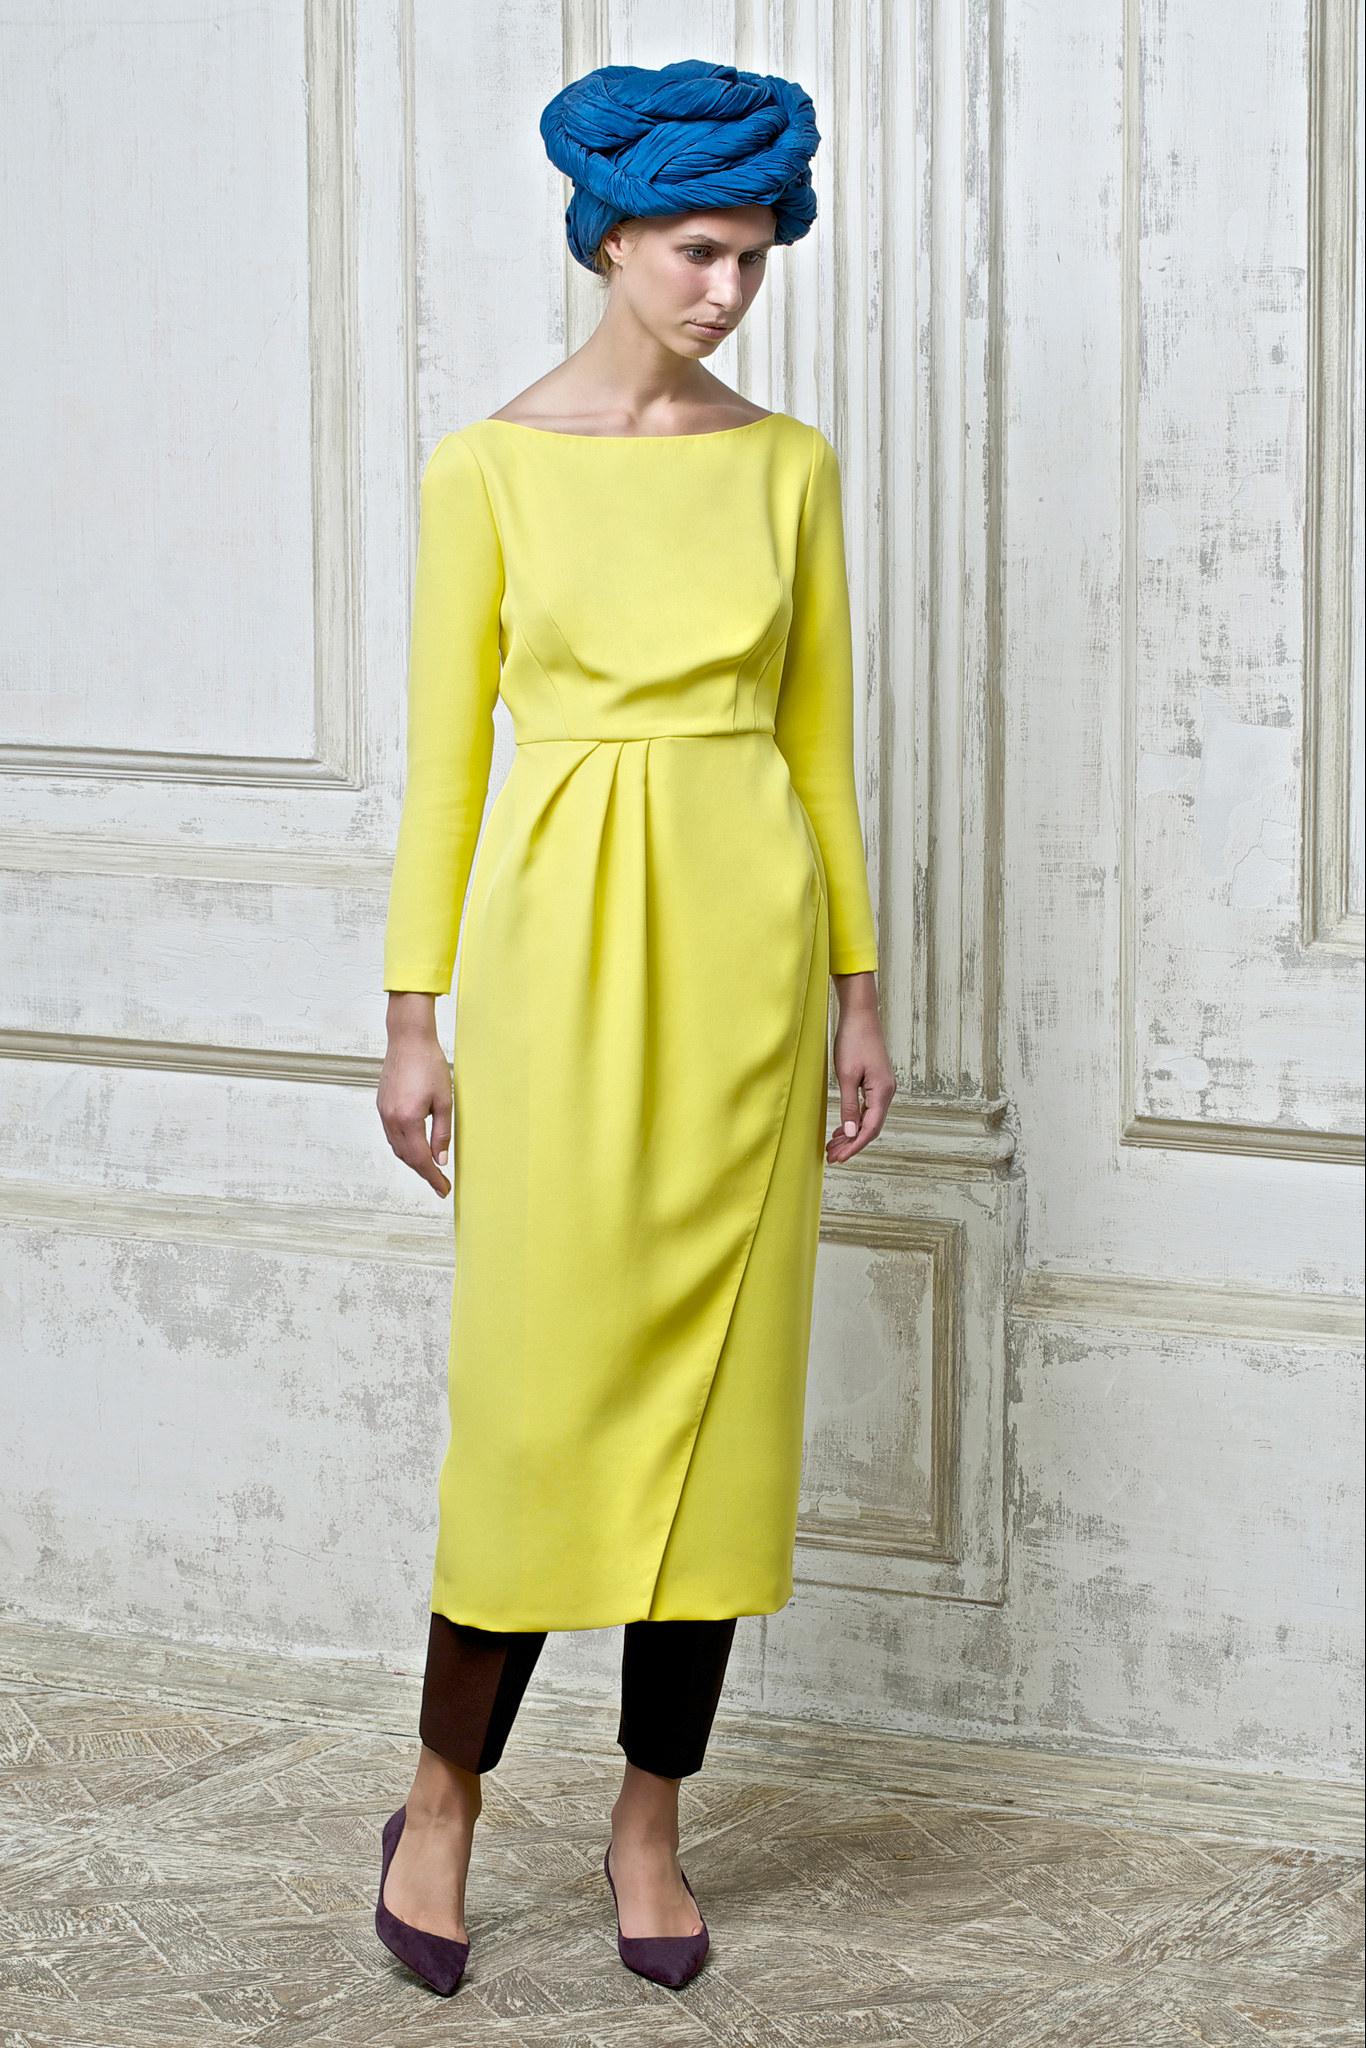 Vika Gazinskaya | Russian Fashion Designer